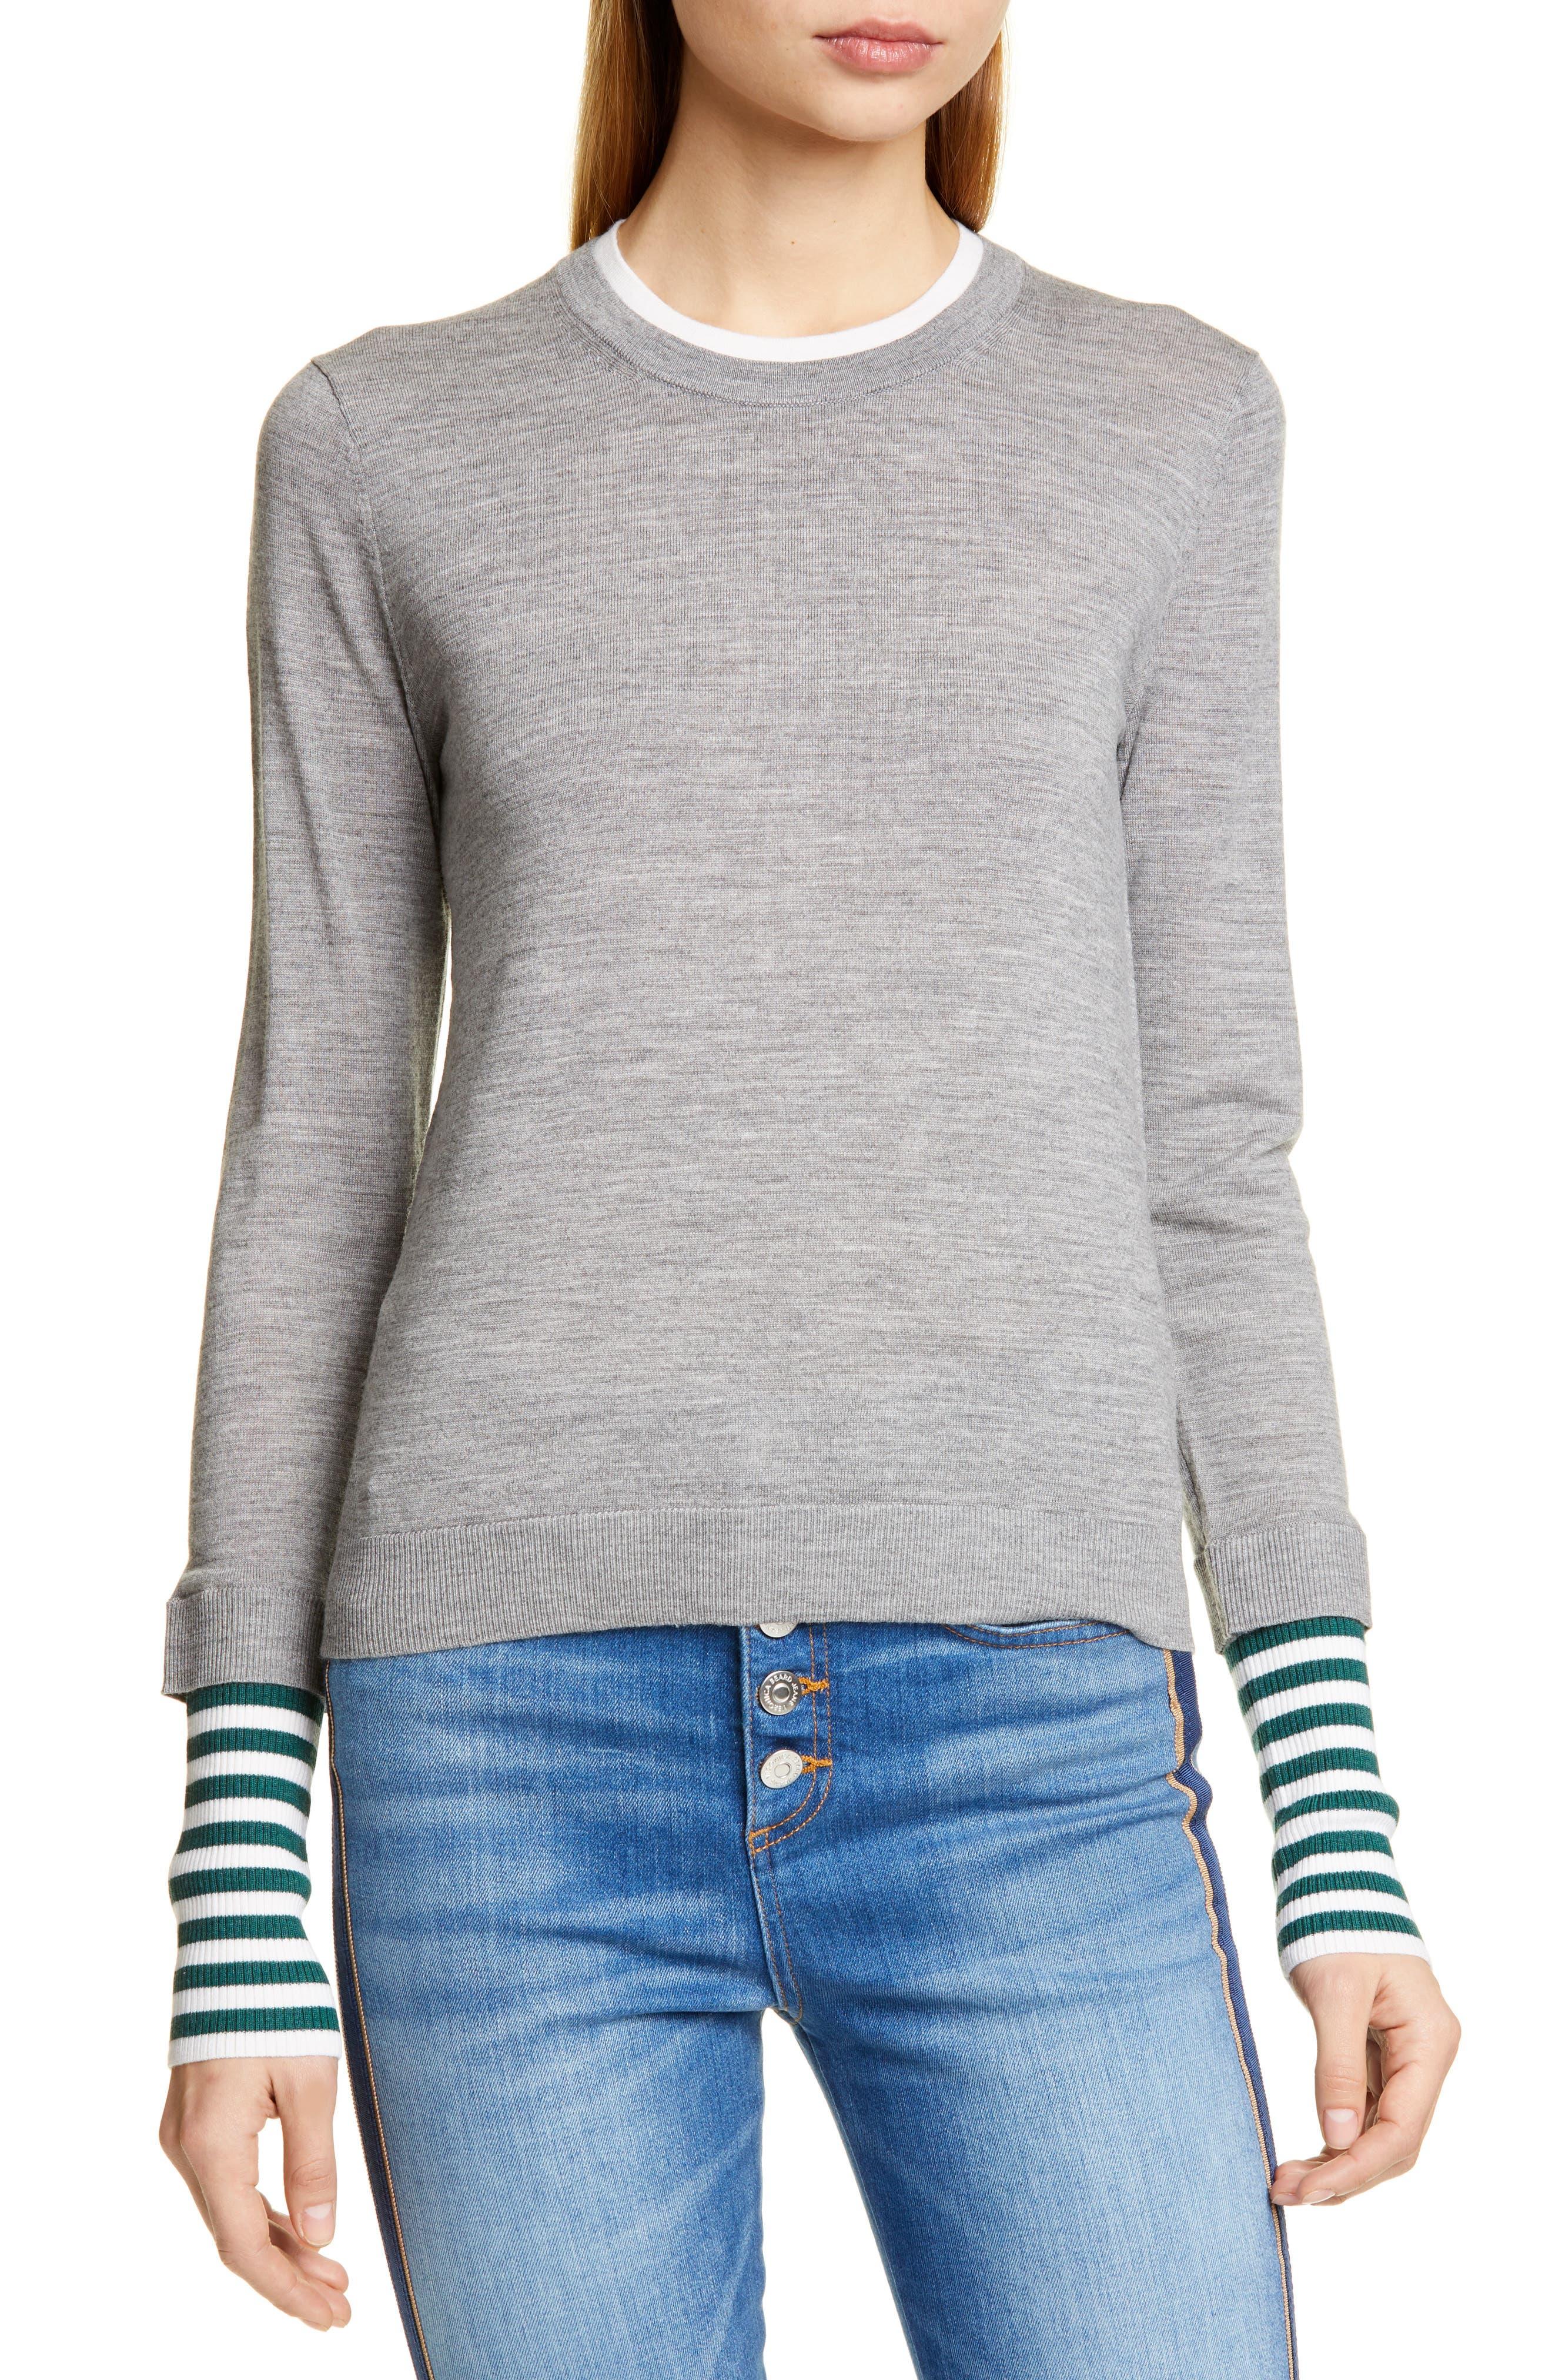 Veronica Beard Avory Contrast Cuff Merino Wool Sweater, Grey